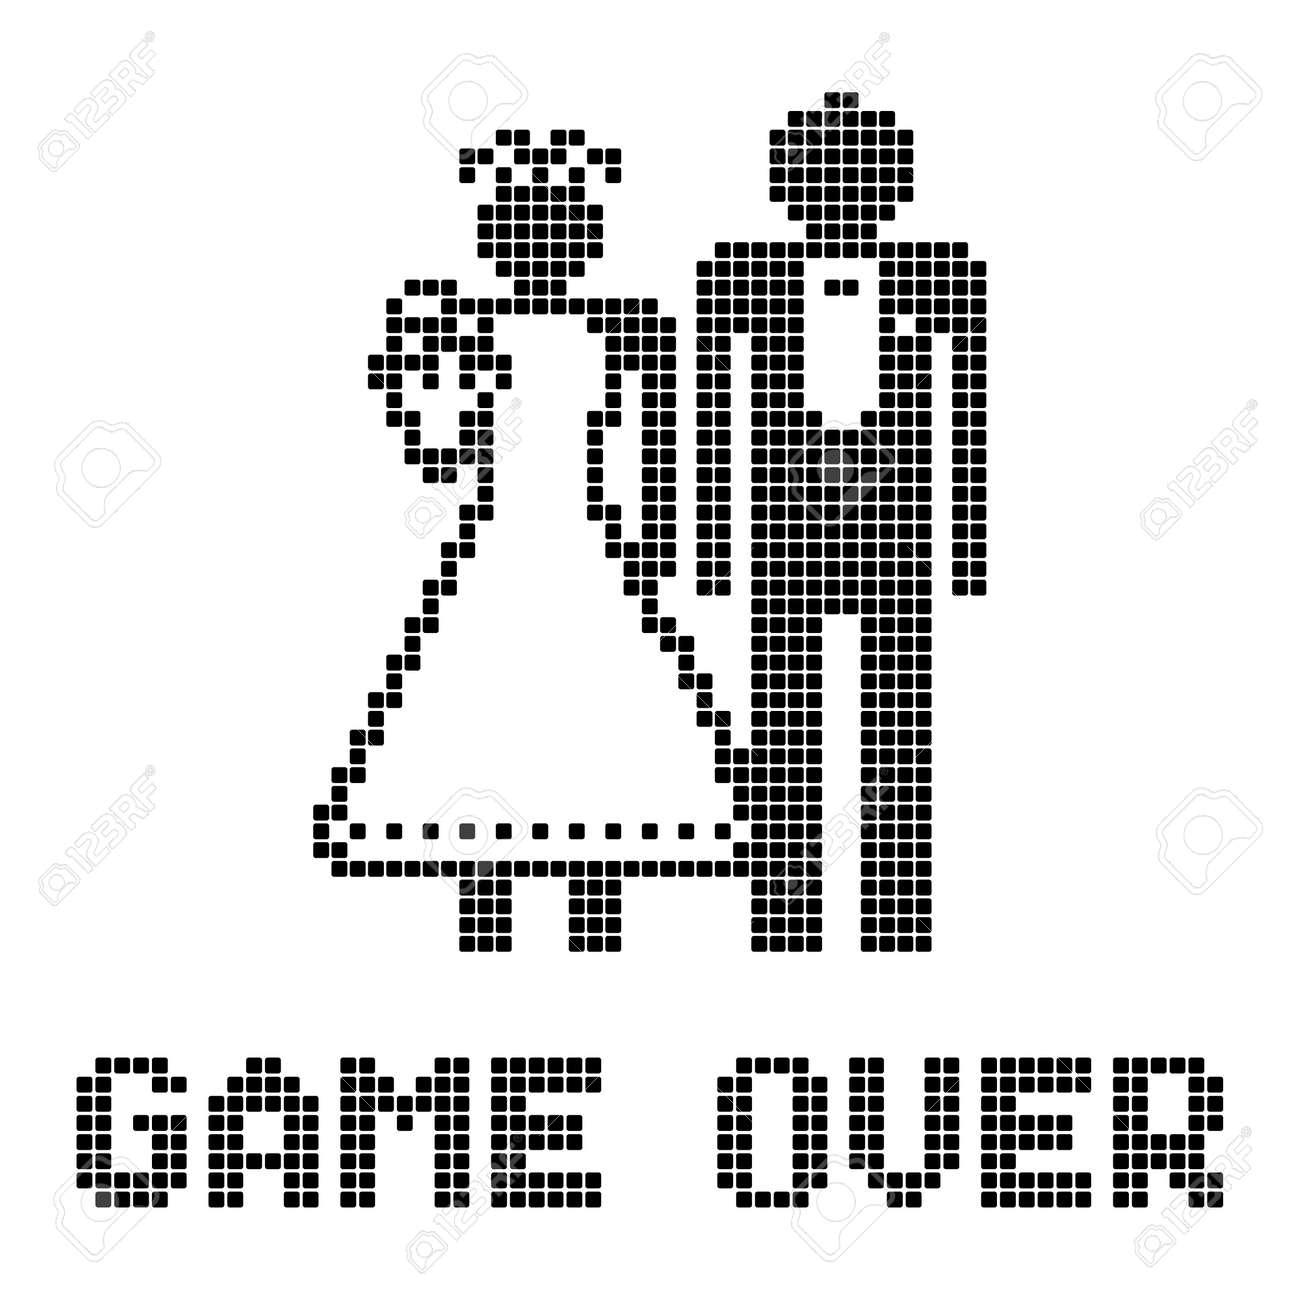 Funny wedding symbol - Game Over - 14358323